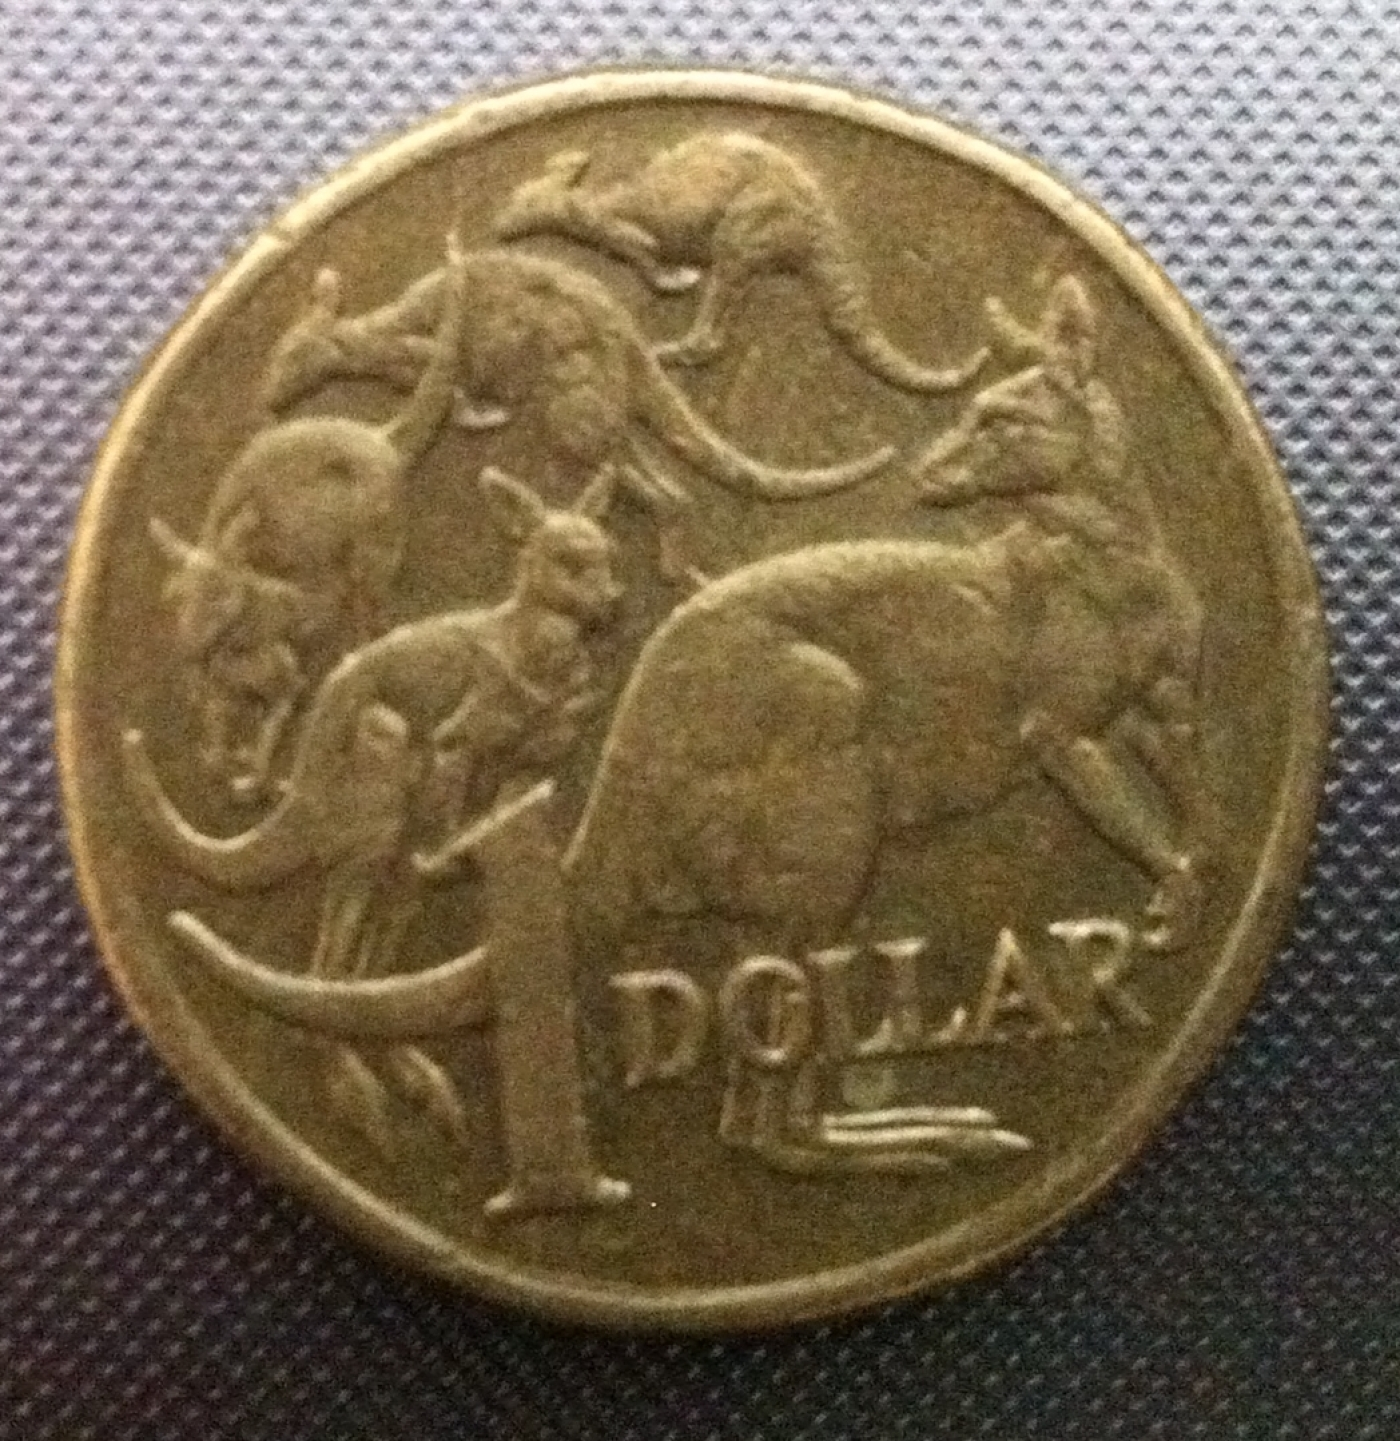 1 Dollar 2006 Elizabeth Ii 1952 Present Australia